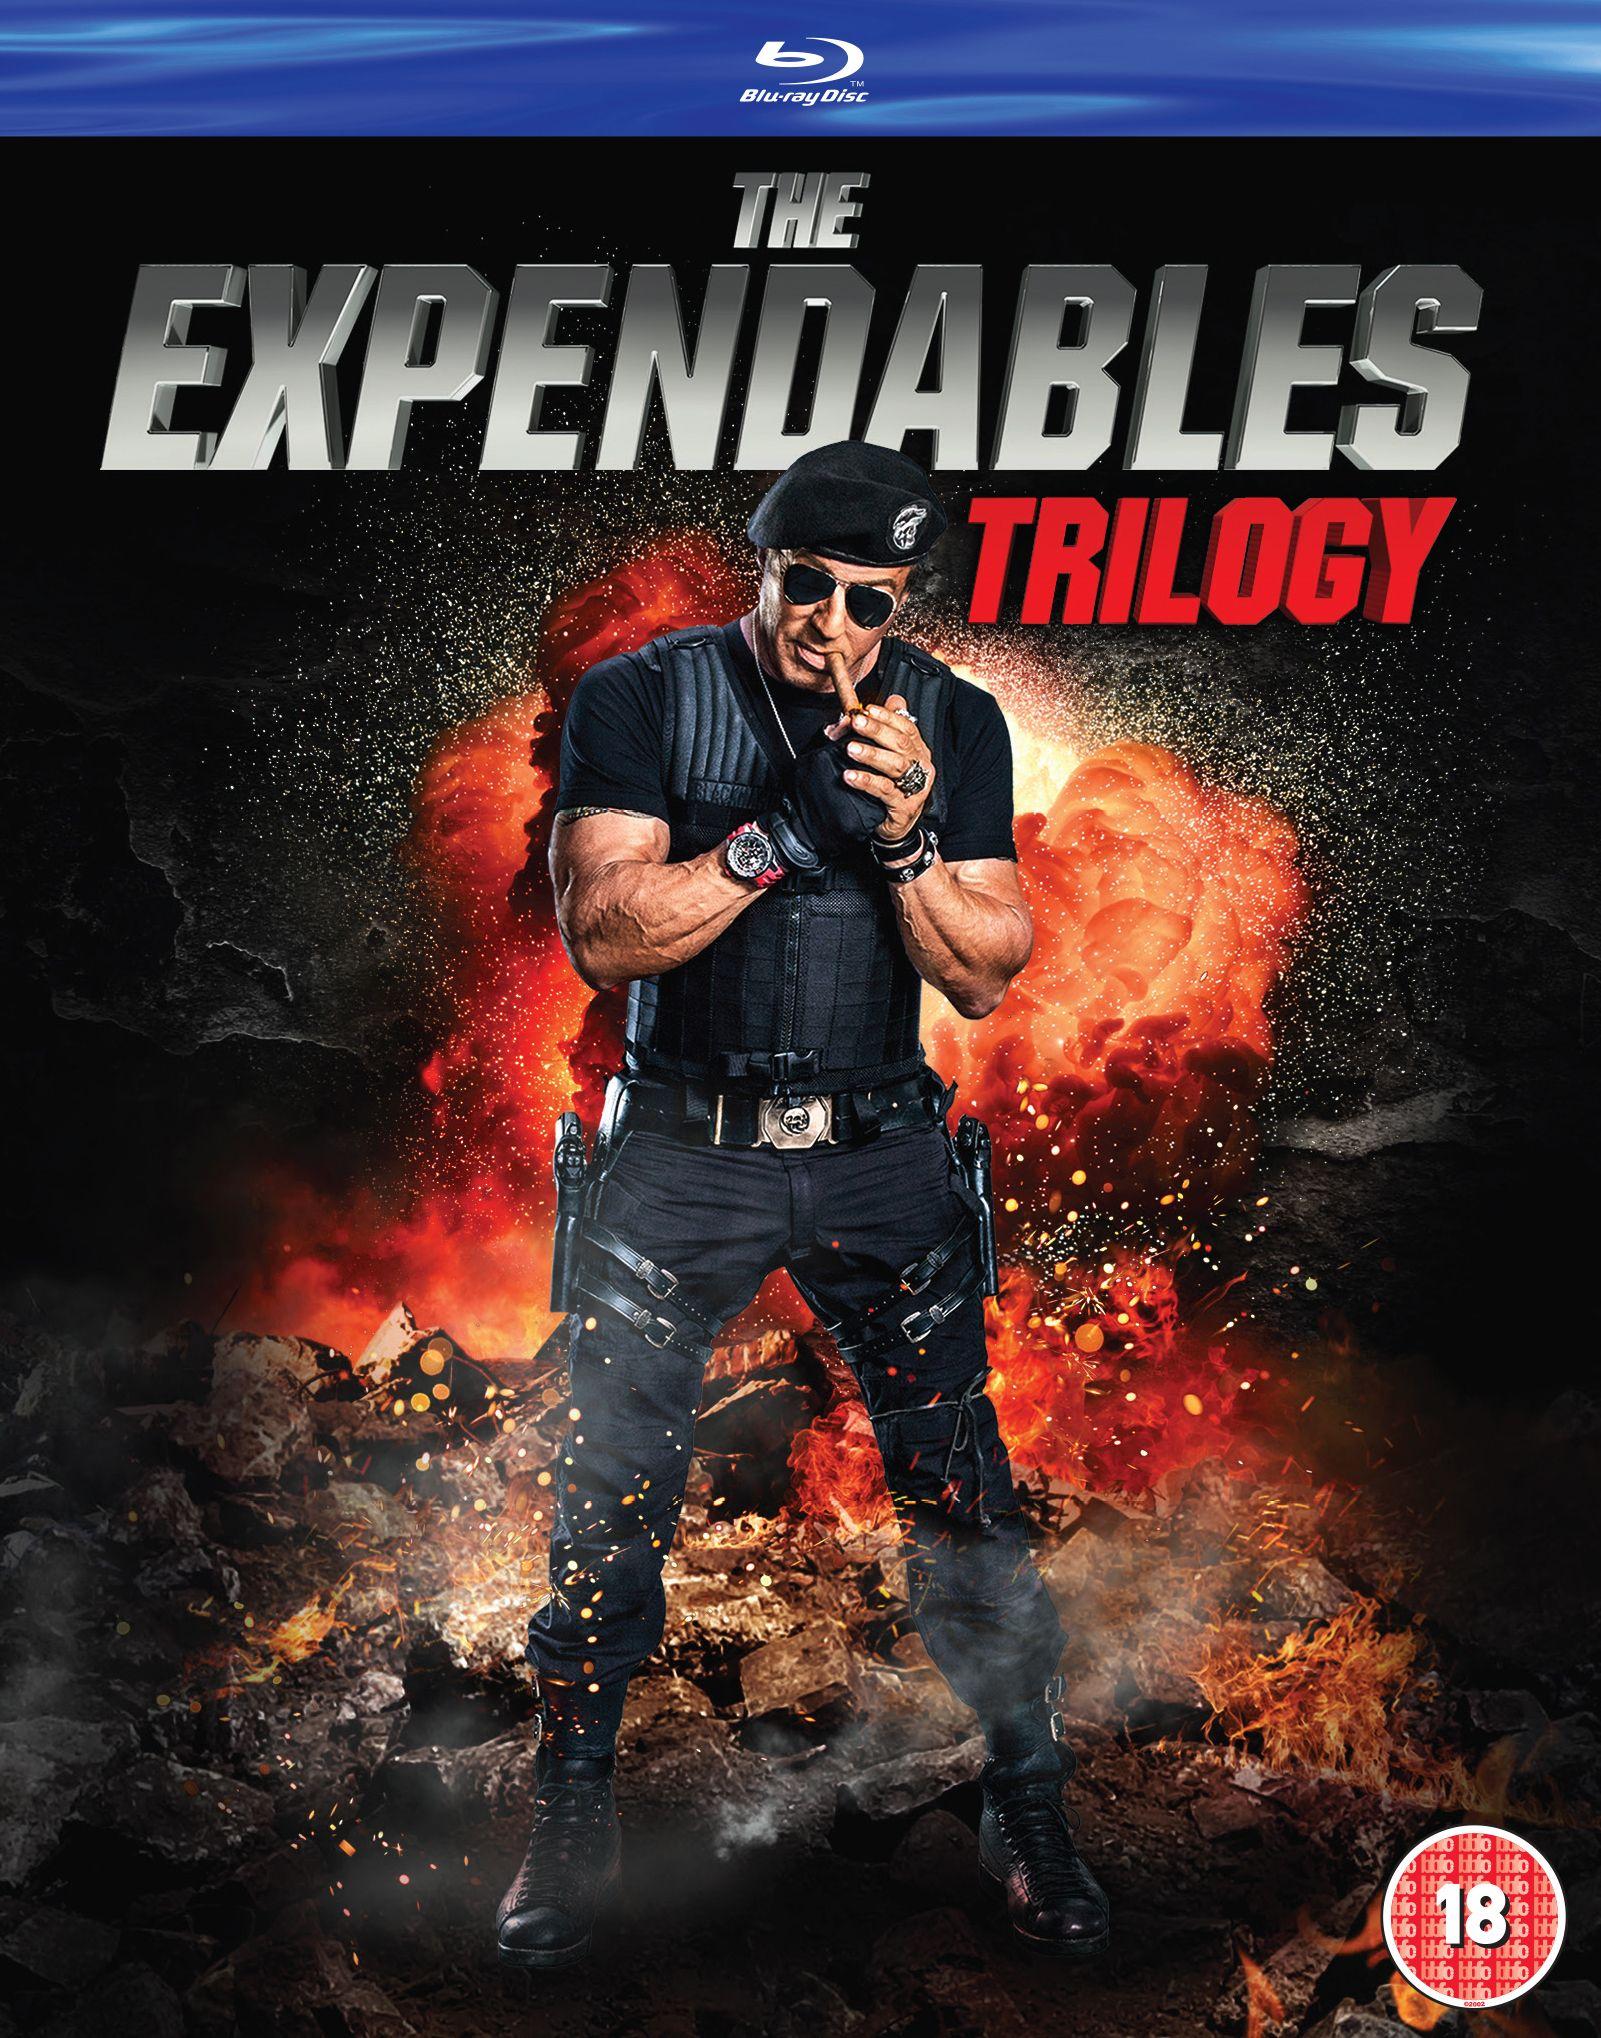 The Expendables trilogy blu ray £7 @ Amazon (£2.99 p&p non prime) 4%tcb